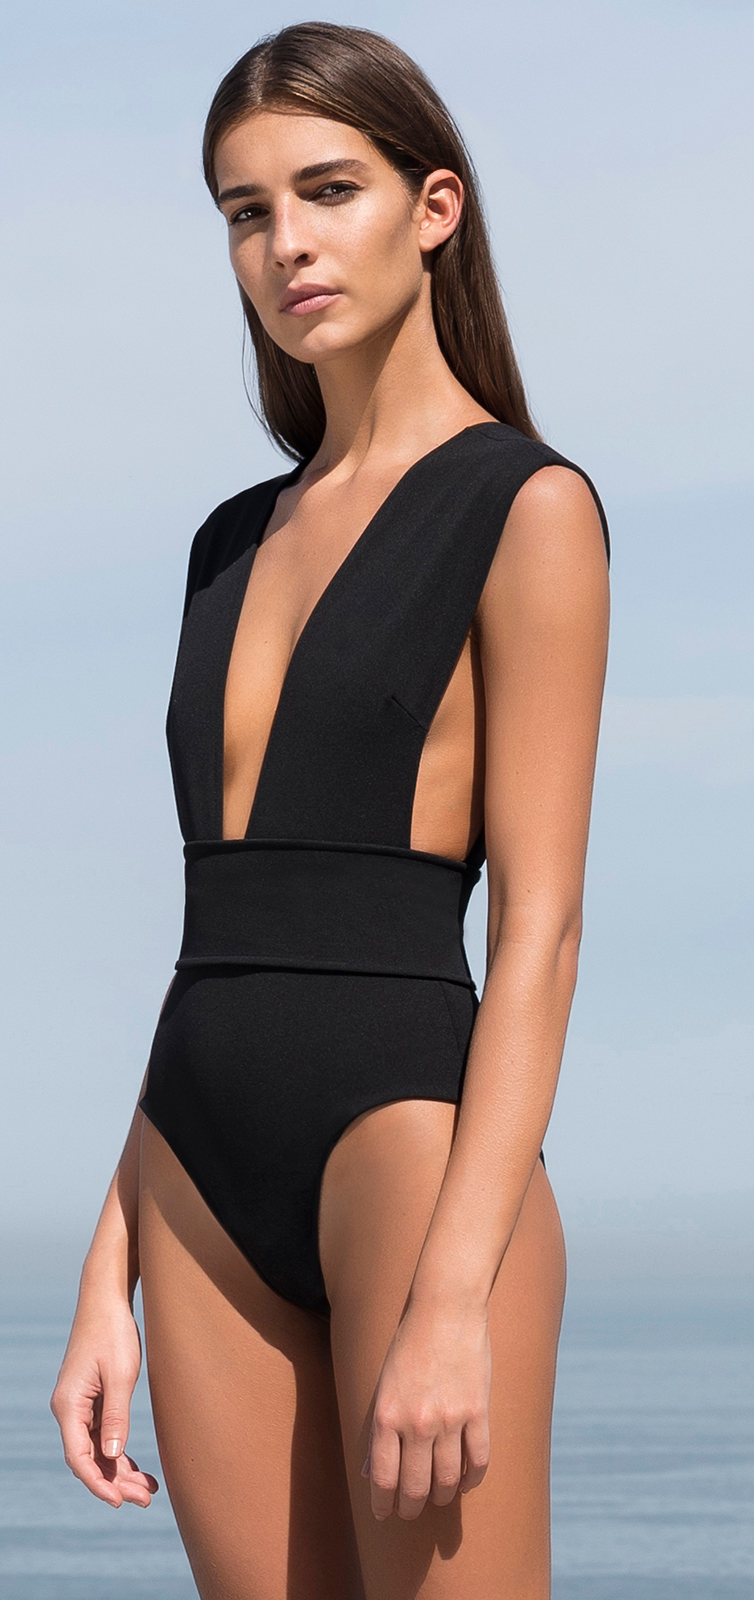 c7660677f80f3 Black Tricot Knit Swimsuit Deep V Neckline - MaiÔ V Crepe Preto - HAIGHT